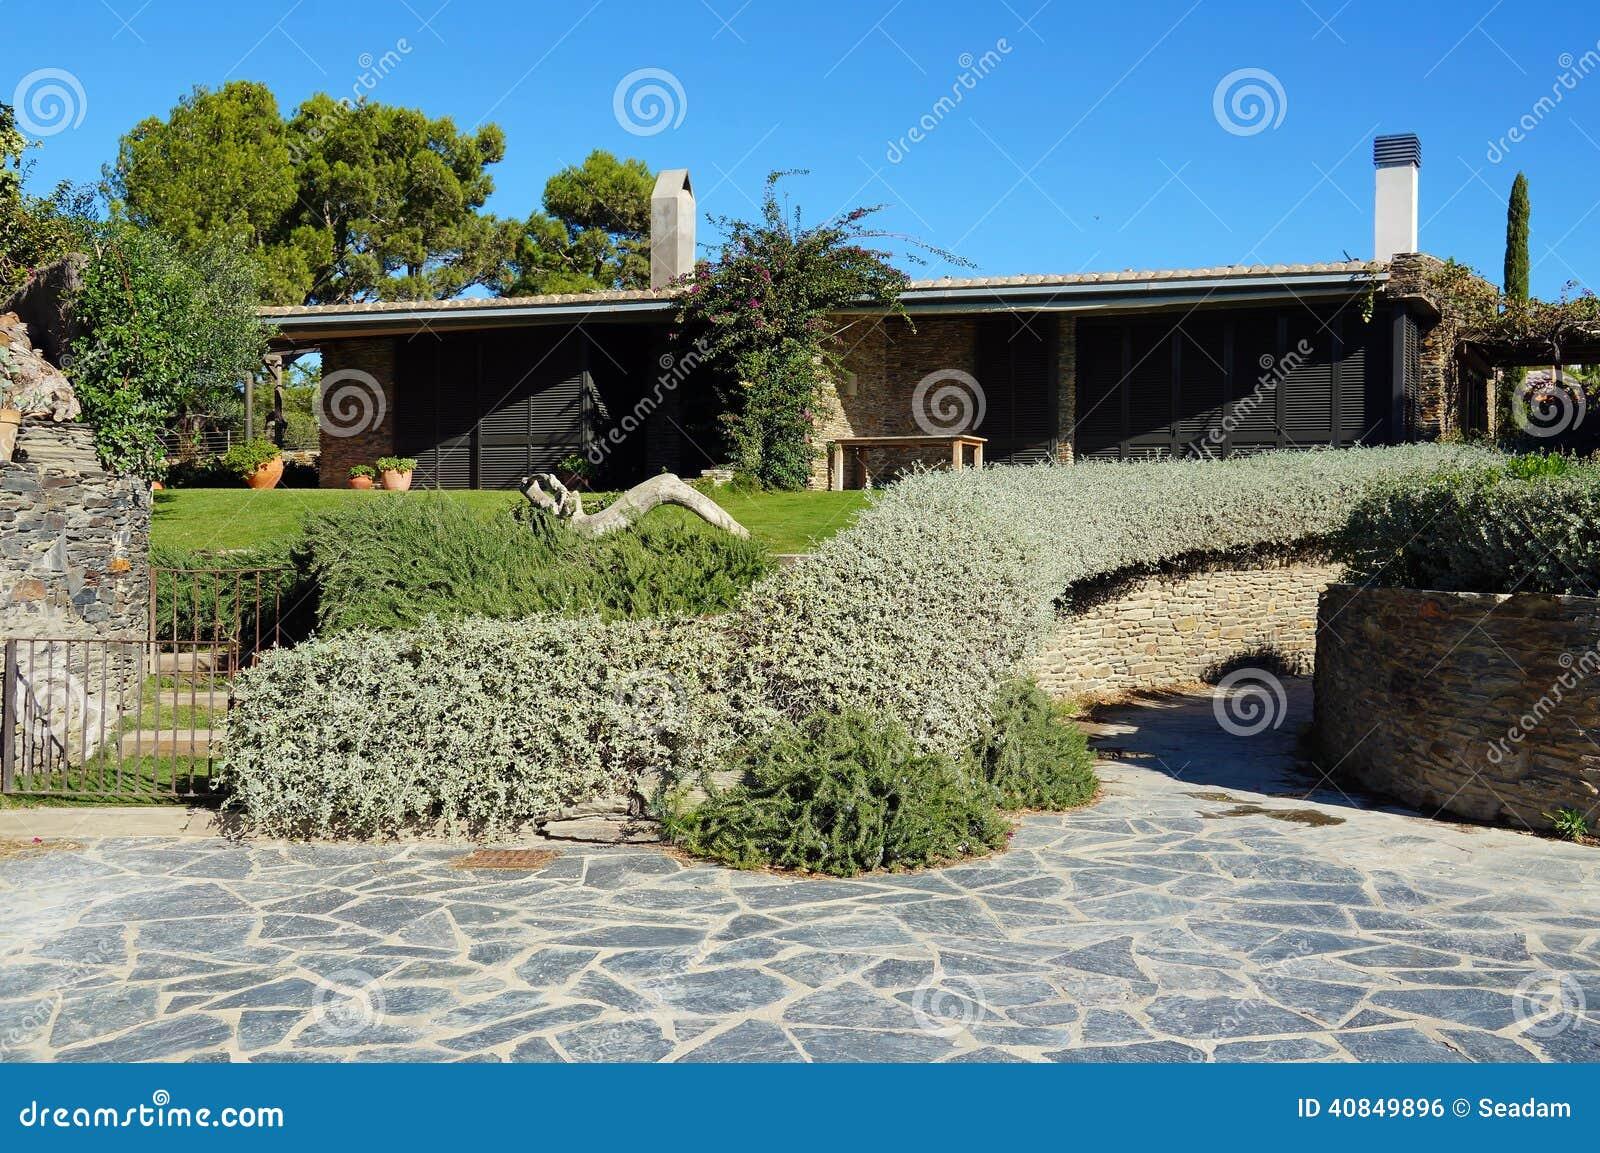 Casa y jardin promocin hbridos gerbera daisy flower mix for Casa jardin insecticida